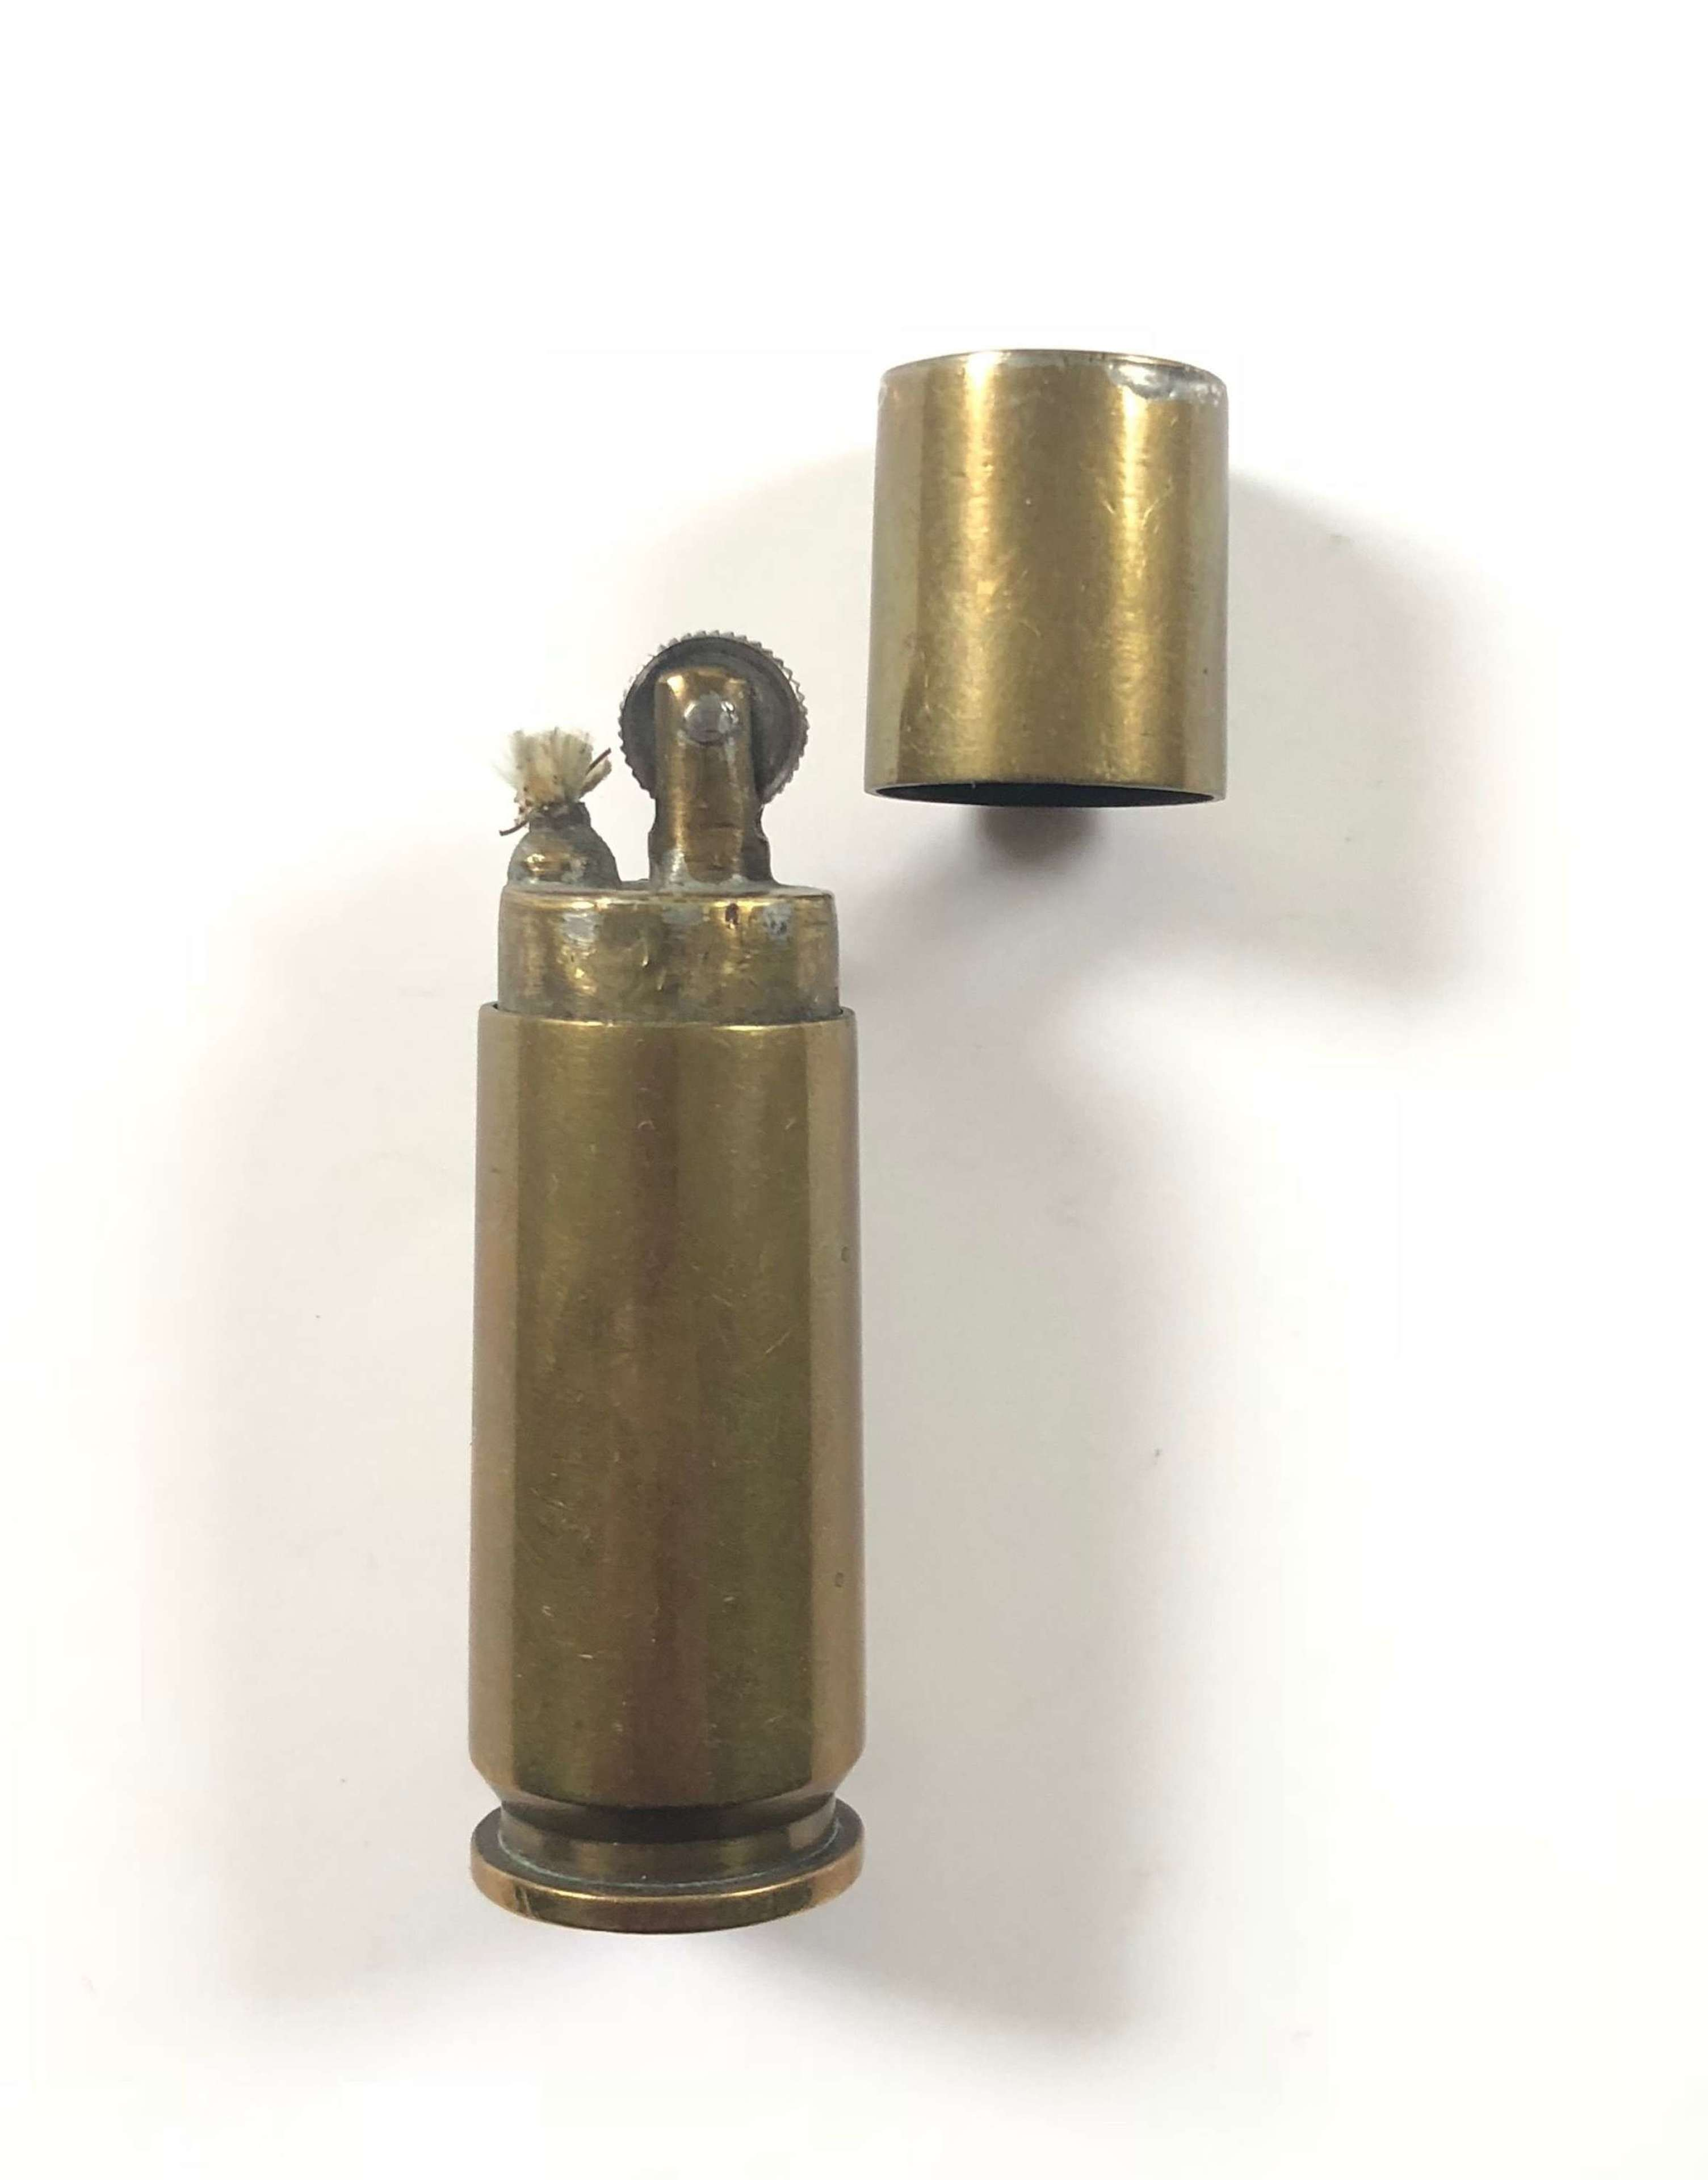 WW2 Trench Art Brass Cigarette Lighter.